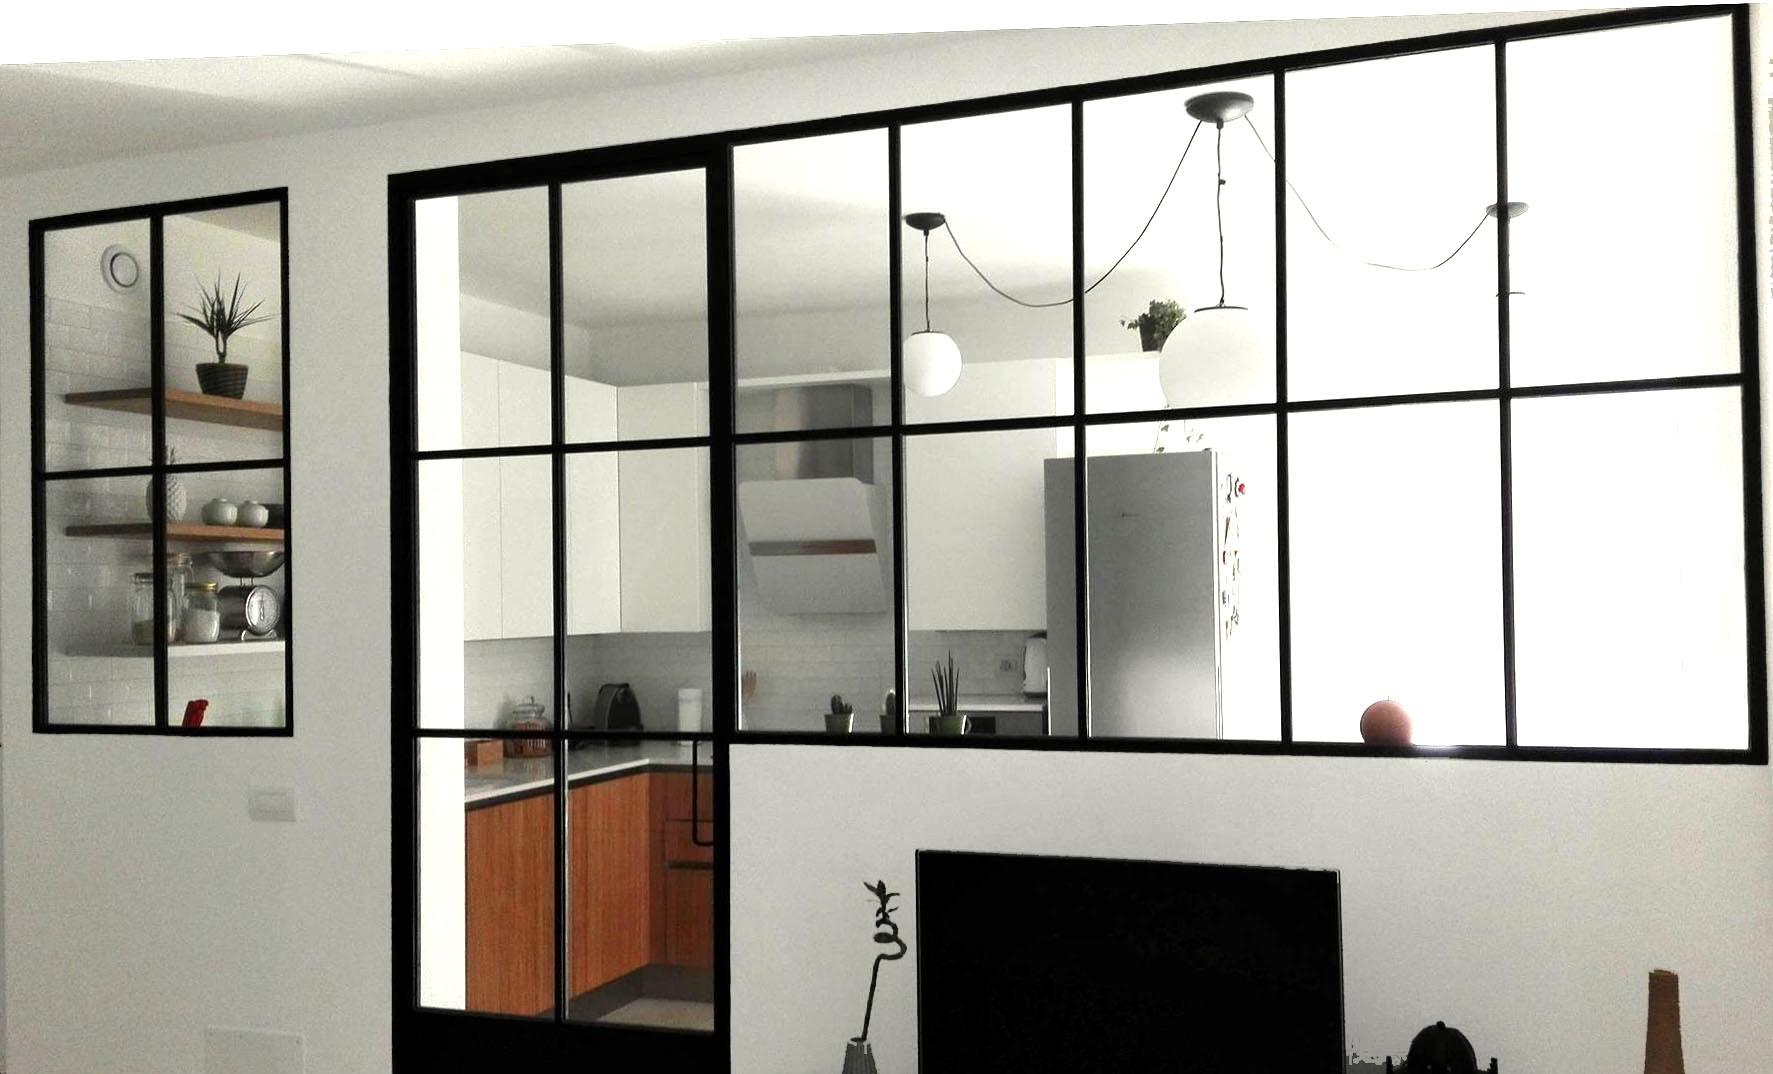 Parete vetrata elegant parete divisoria scorrevole in vetro colore bianco latte with parete - Parete vetrata esterna ...